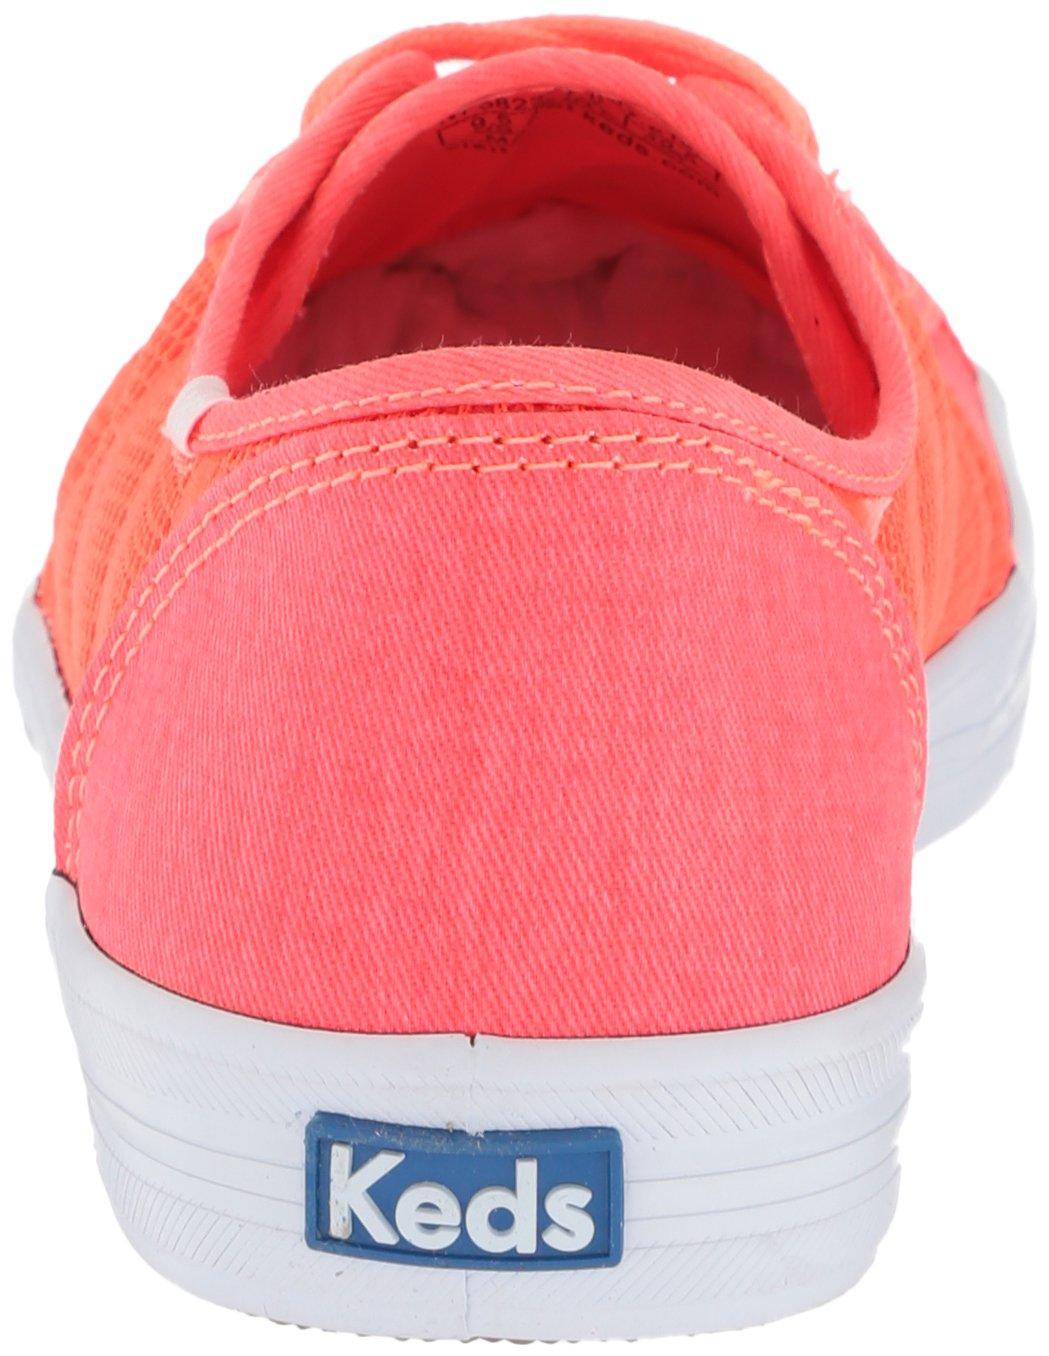 Keds Women's B072YCK9F2 Kickstart Striped Mesh Sneaker B072YCK9F2 Women's 6.5 B(M) US|Coral 8a334b